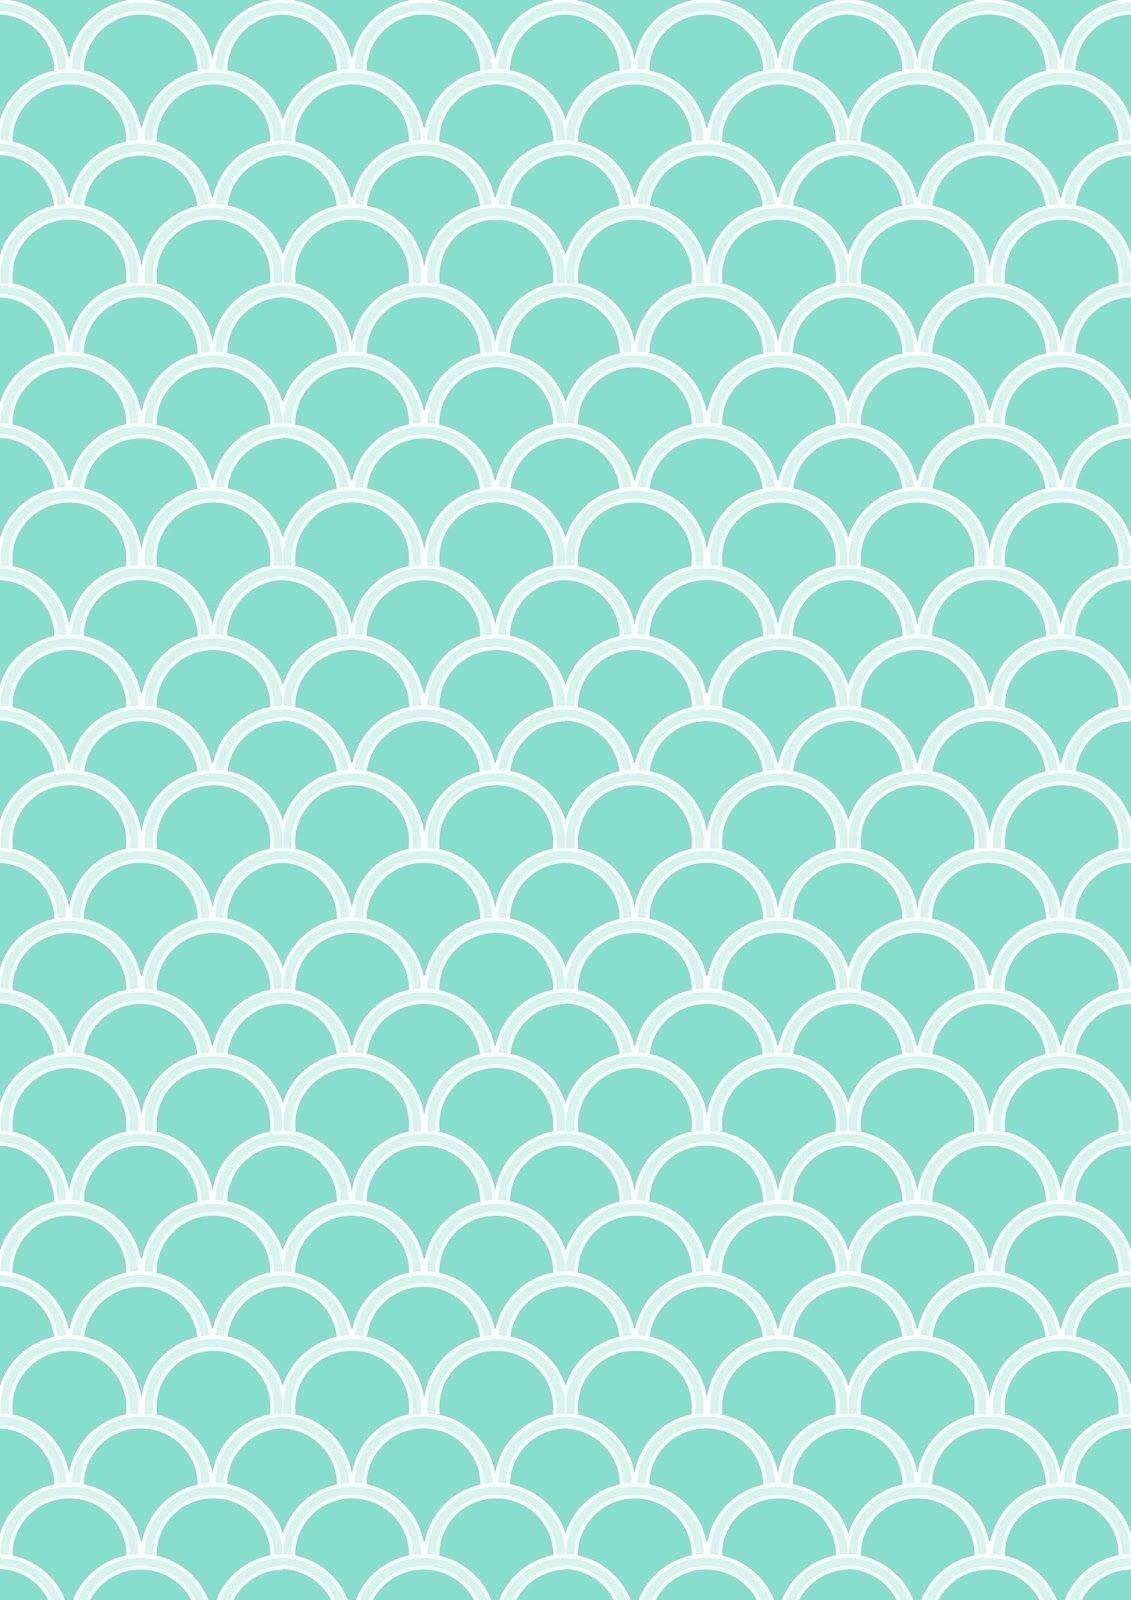 Free Printable Scrapbook Paper Designs Green | Corner Of Chart And Menu - Free Printable Scrapbook Paper